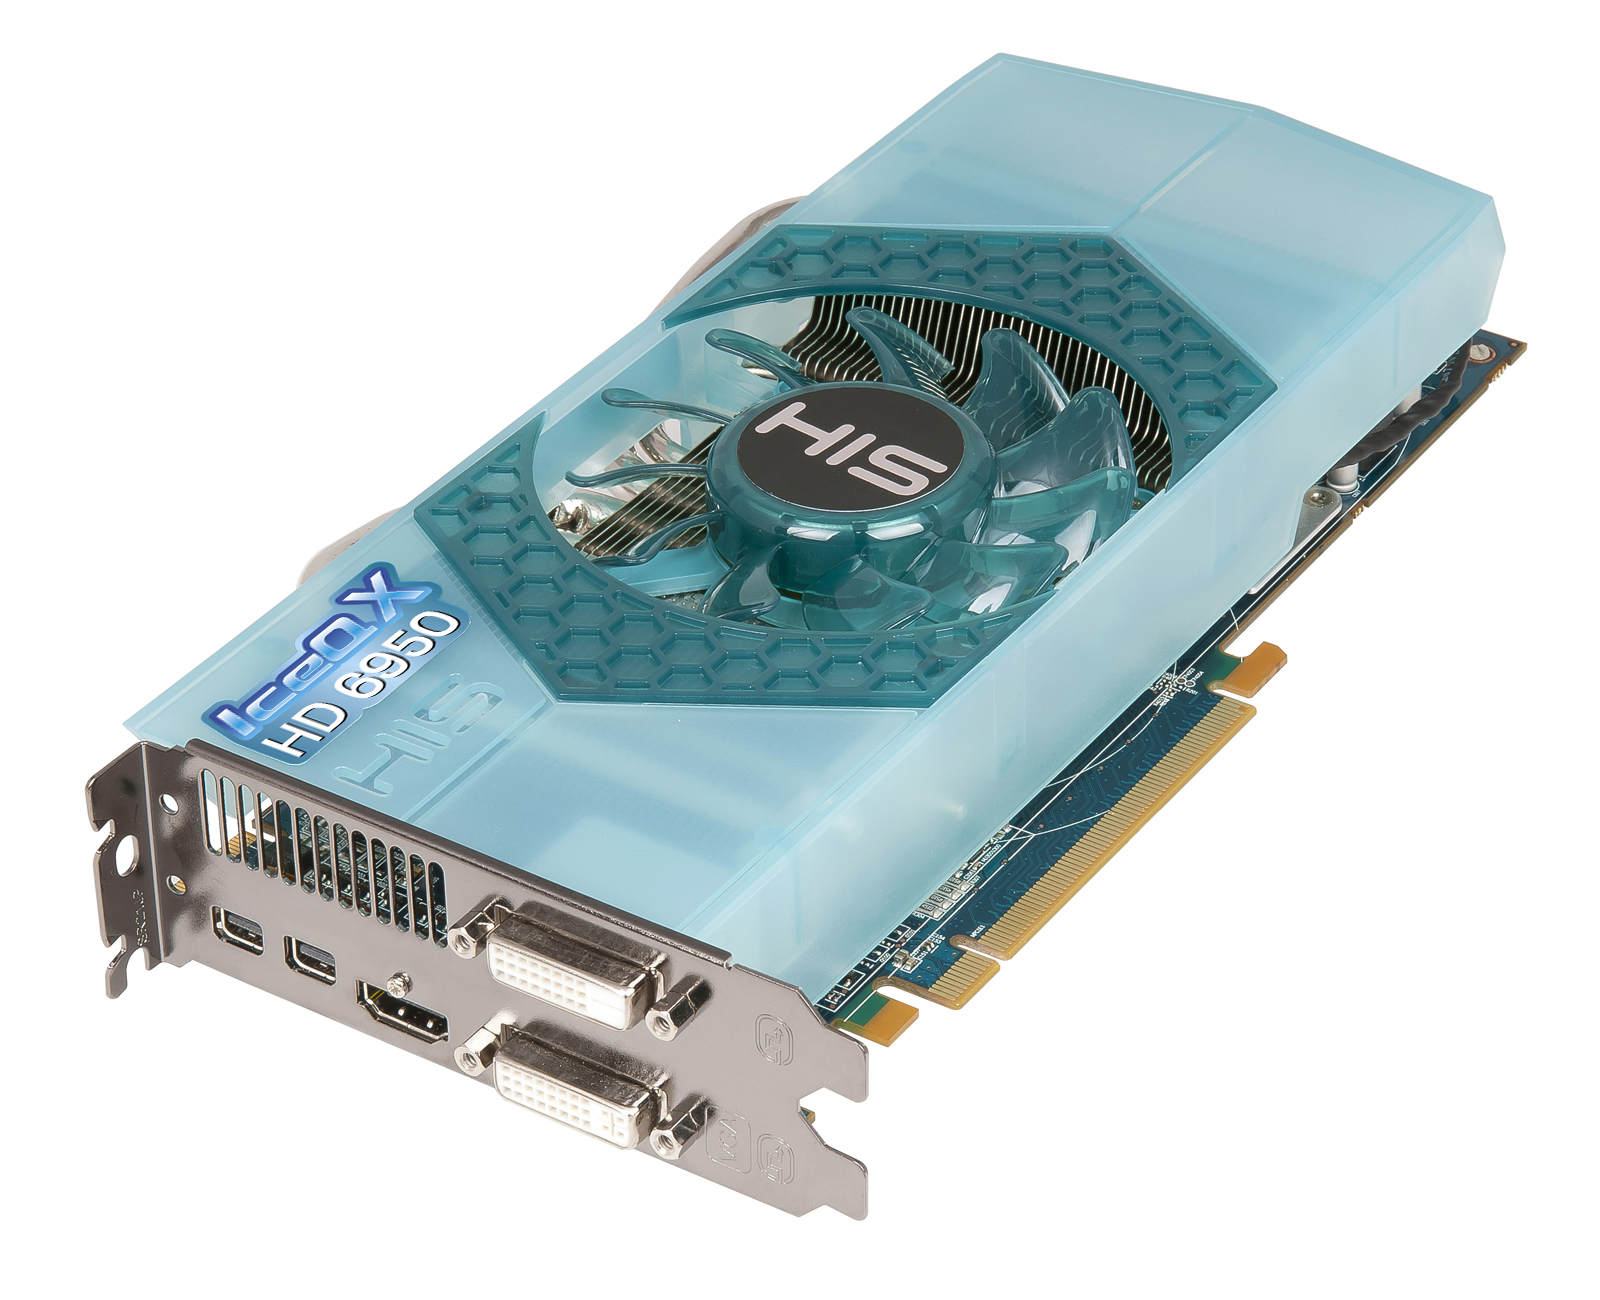 Pubg On Hd 6950: The World's Fastest HD6950: HIS 6950 IceQ X TURBO X Has